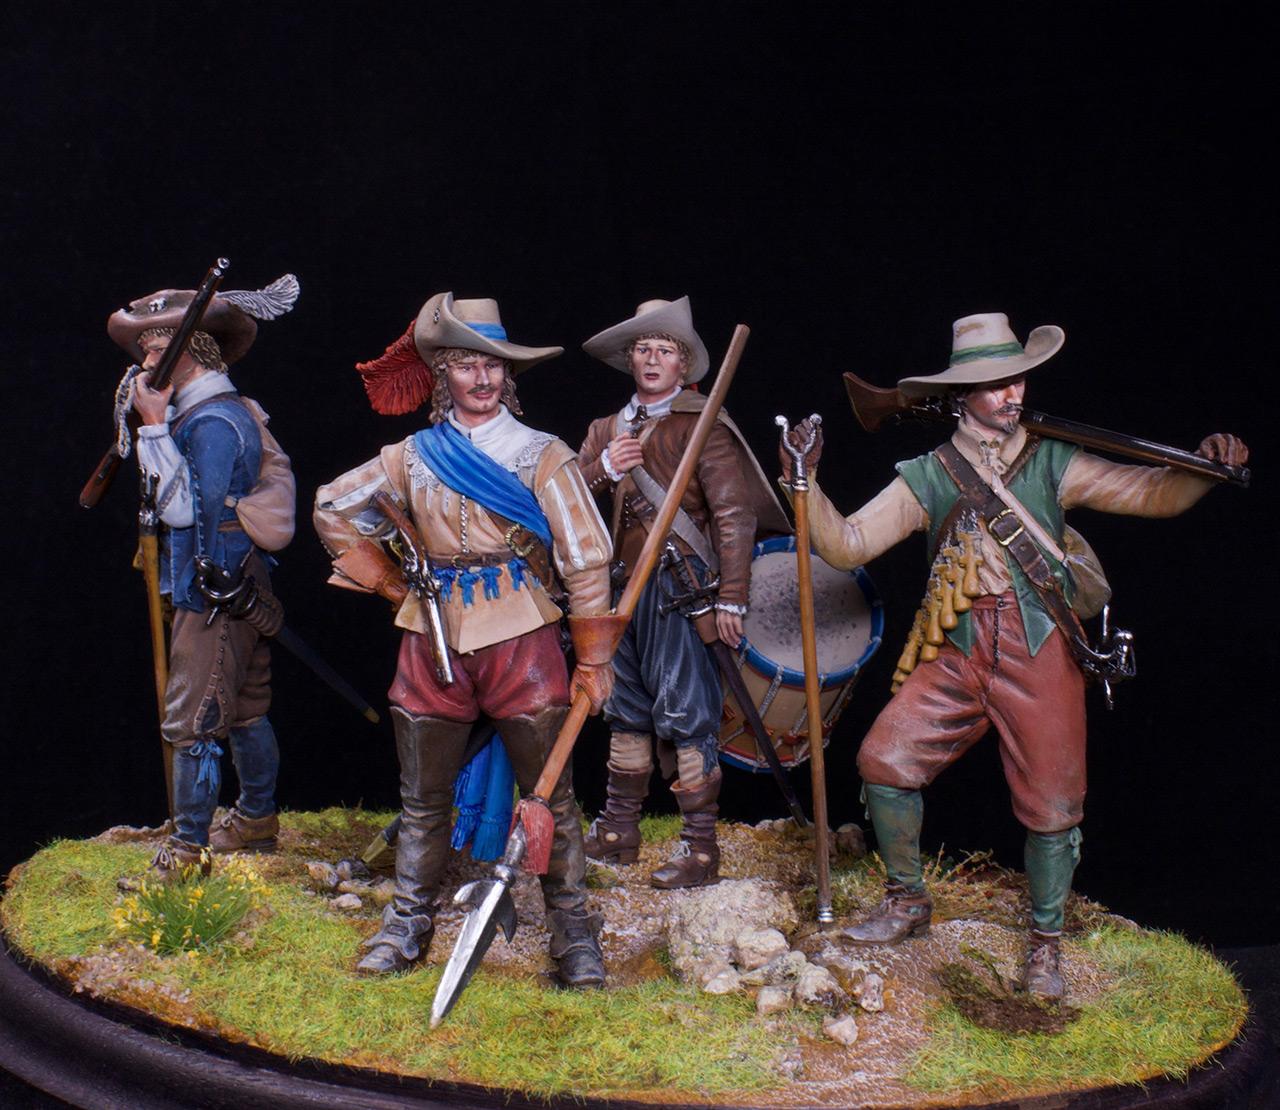 Фигурки: Мушкетеры, барабанщик и офицер, 1630 г. , фото #3